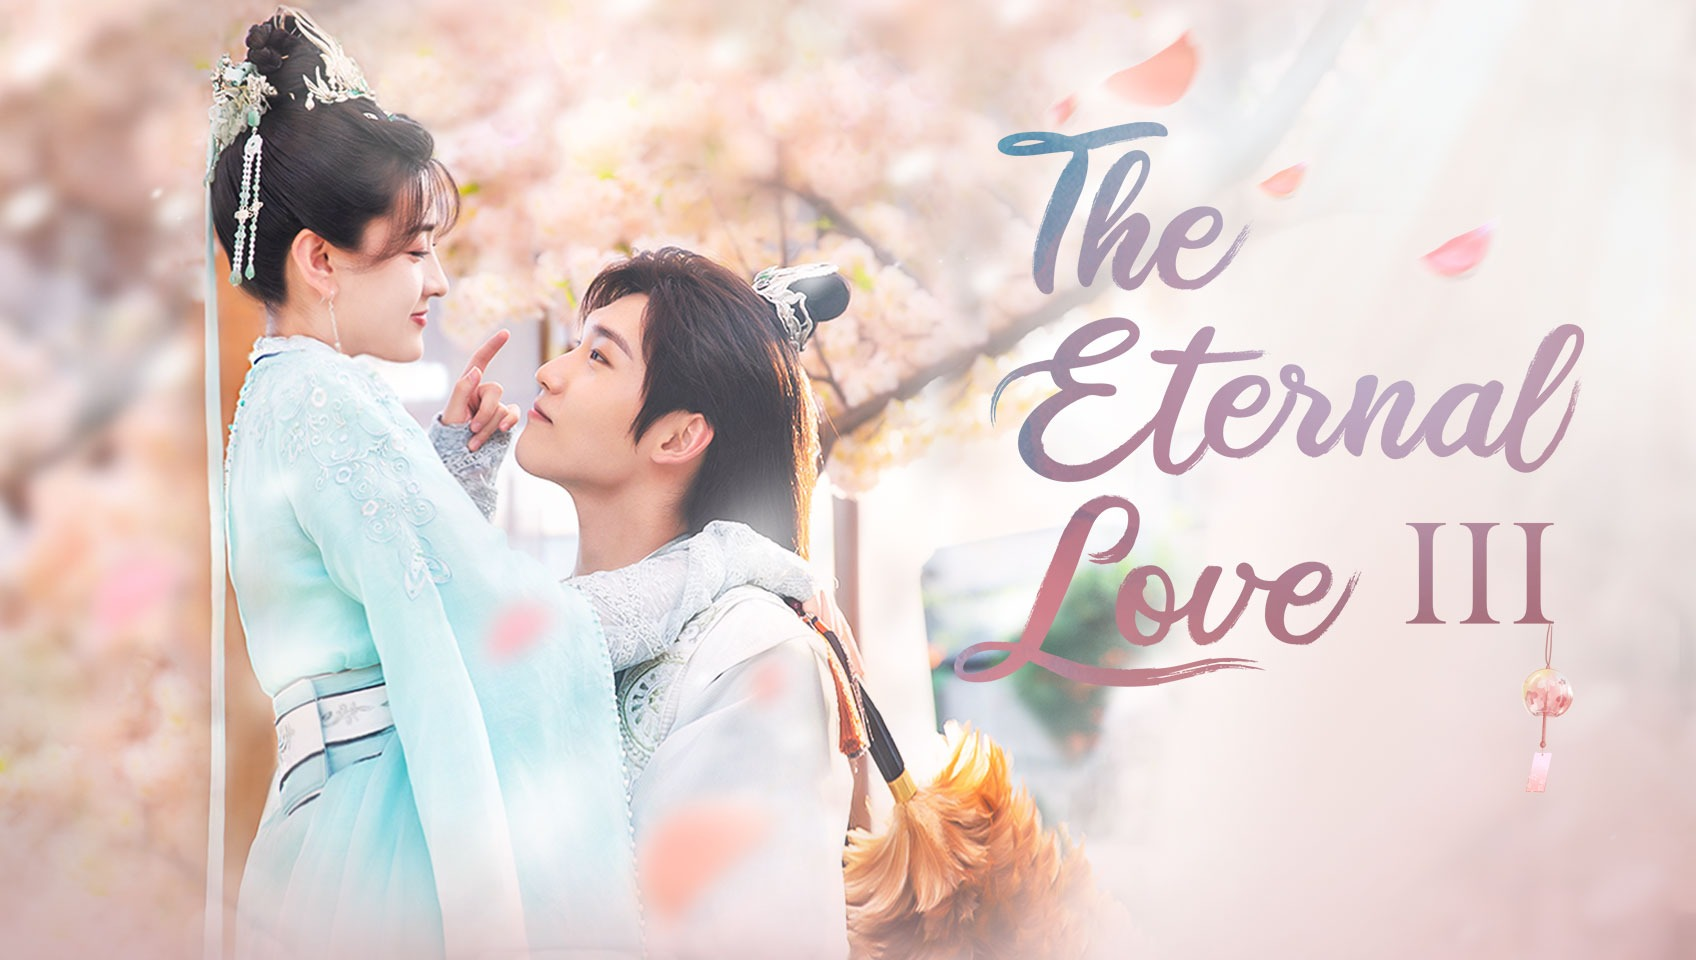 The Eternal Love S3